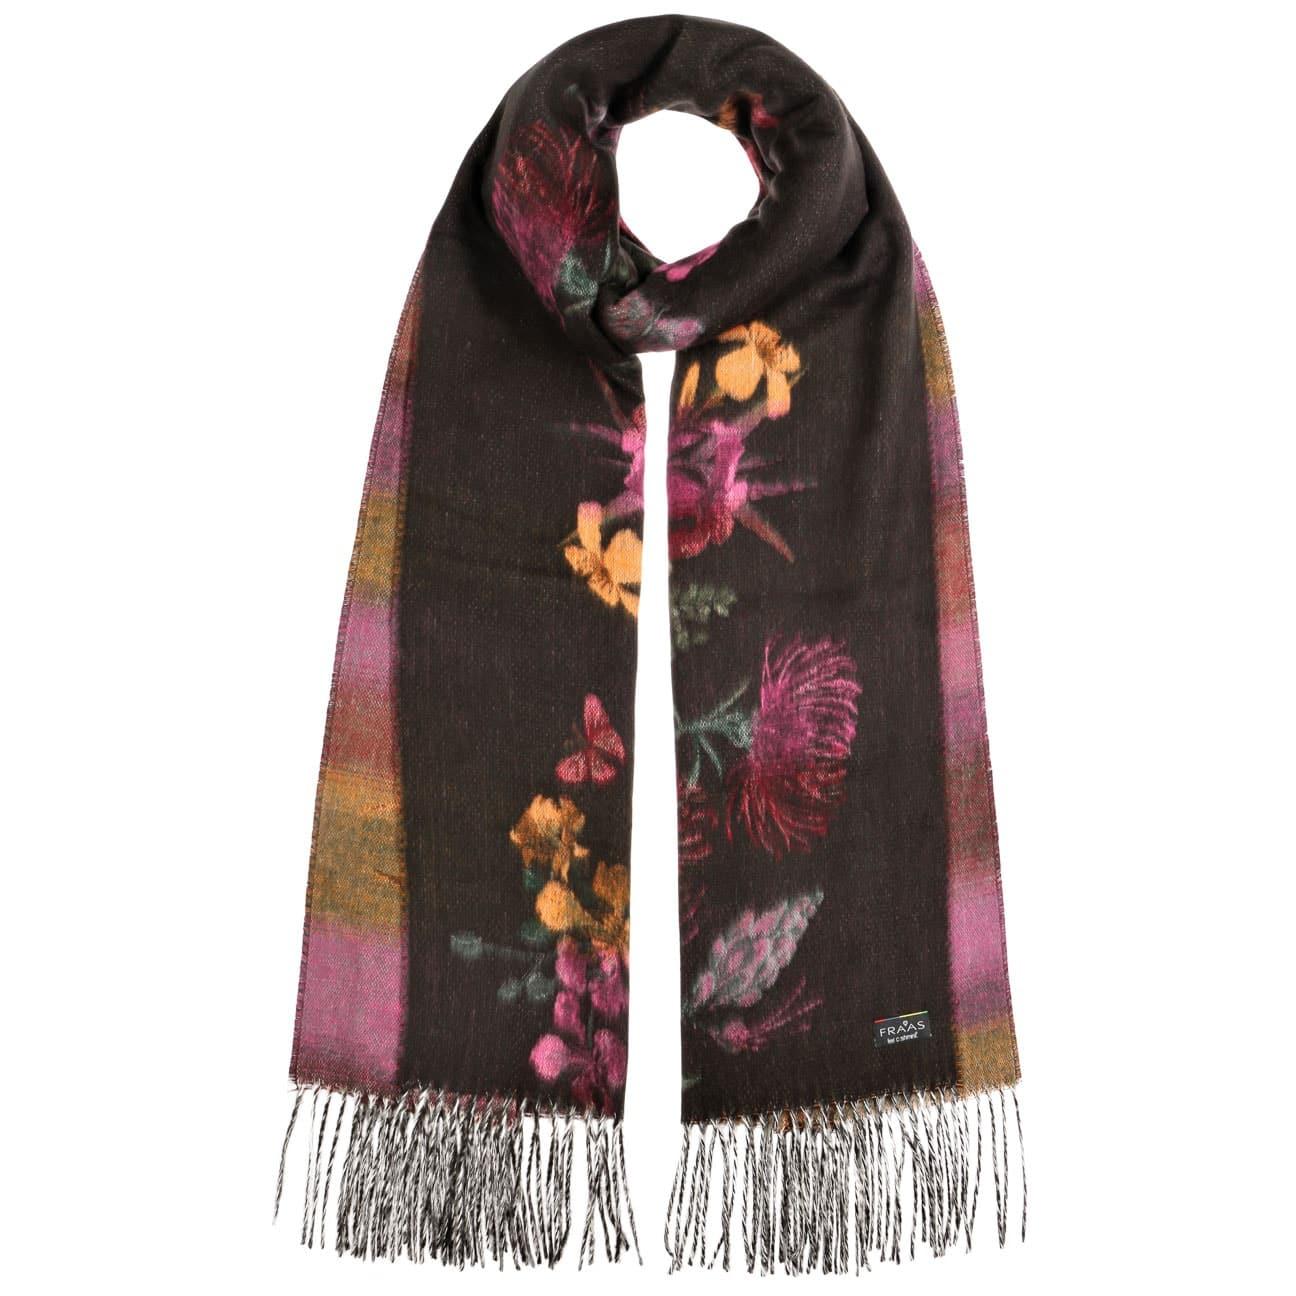 Bufanda Flowers Soft Cashmink by Fraas